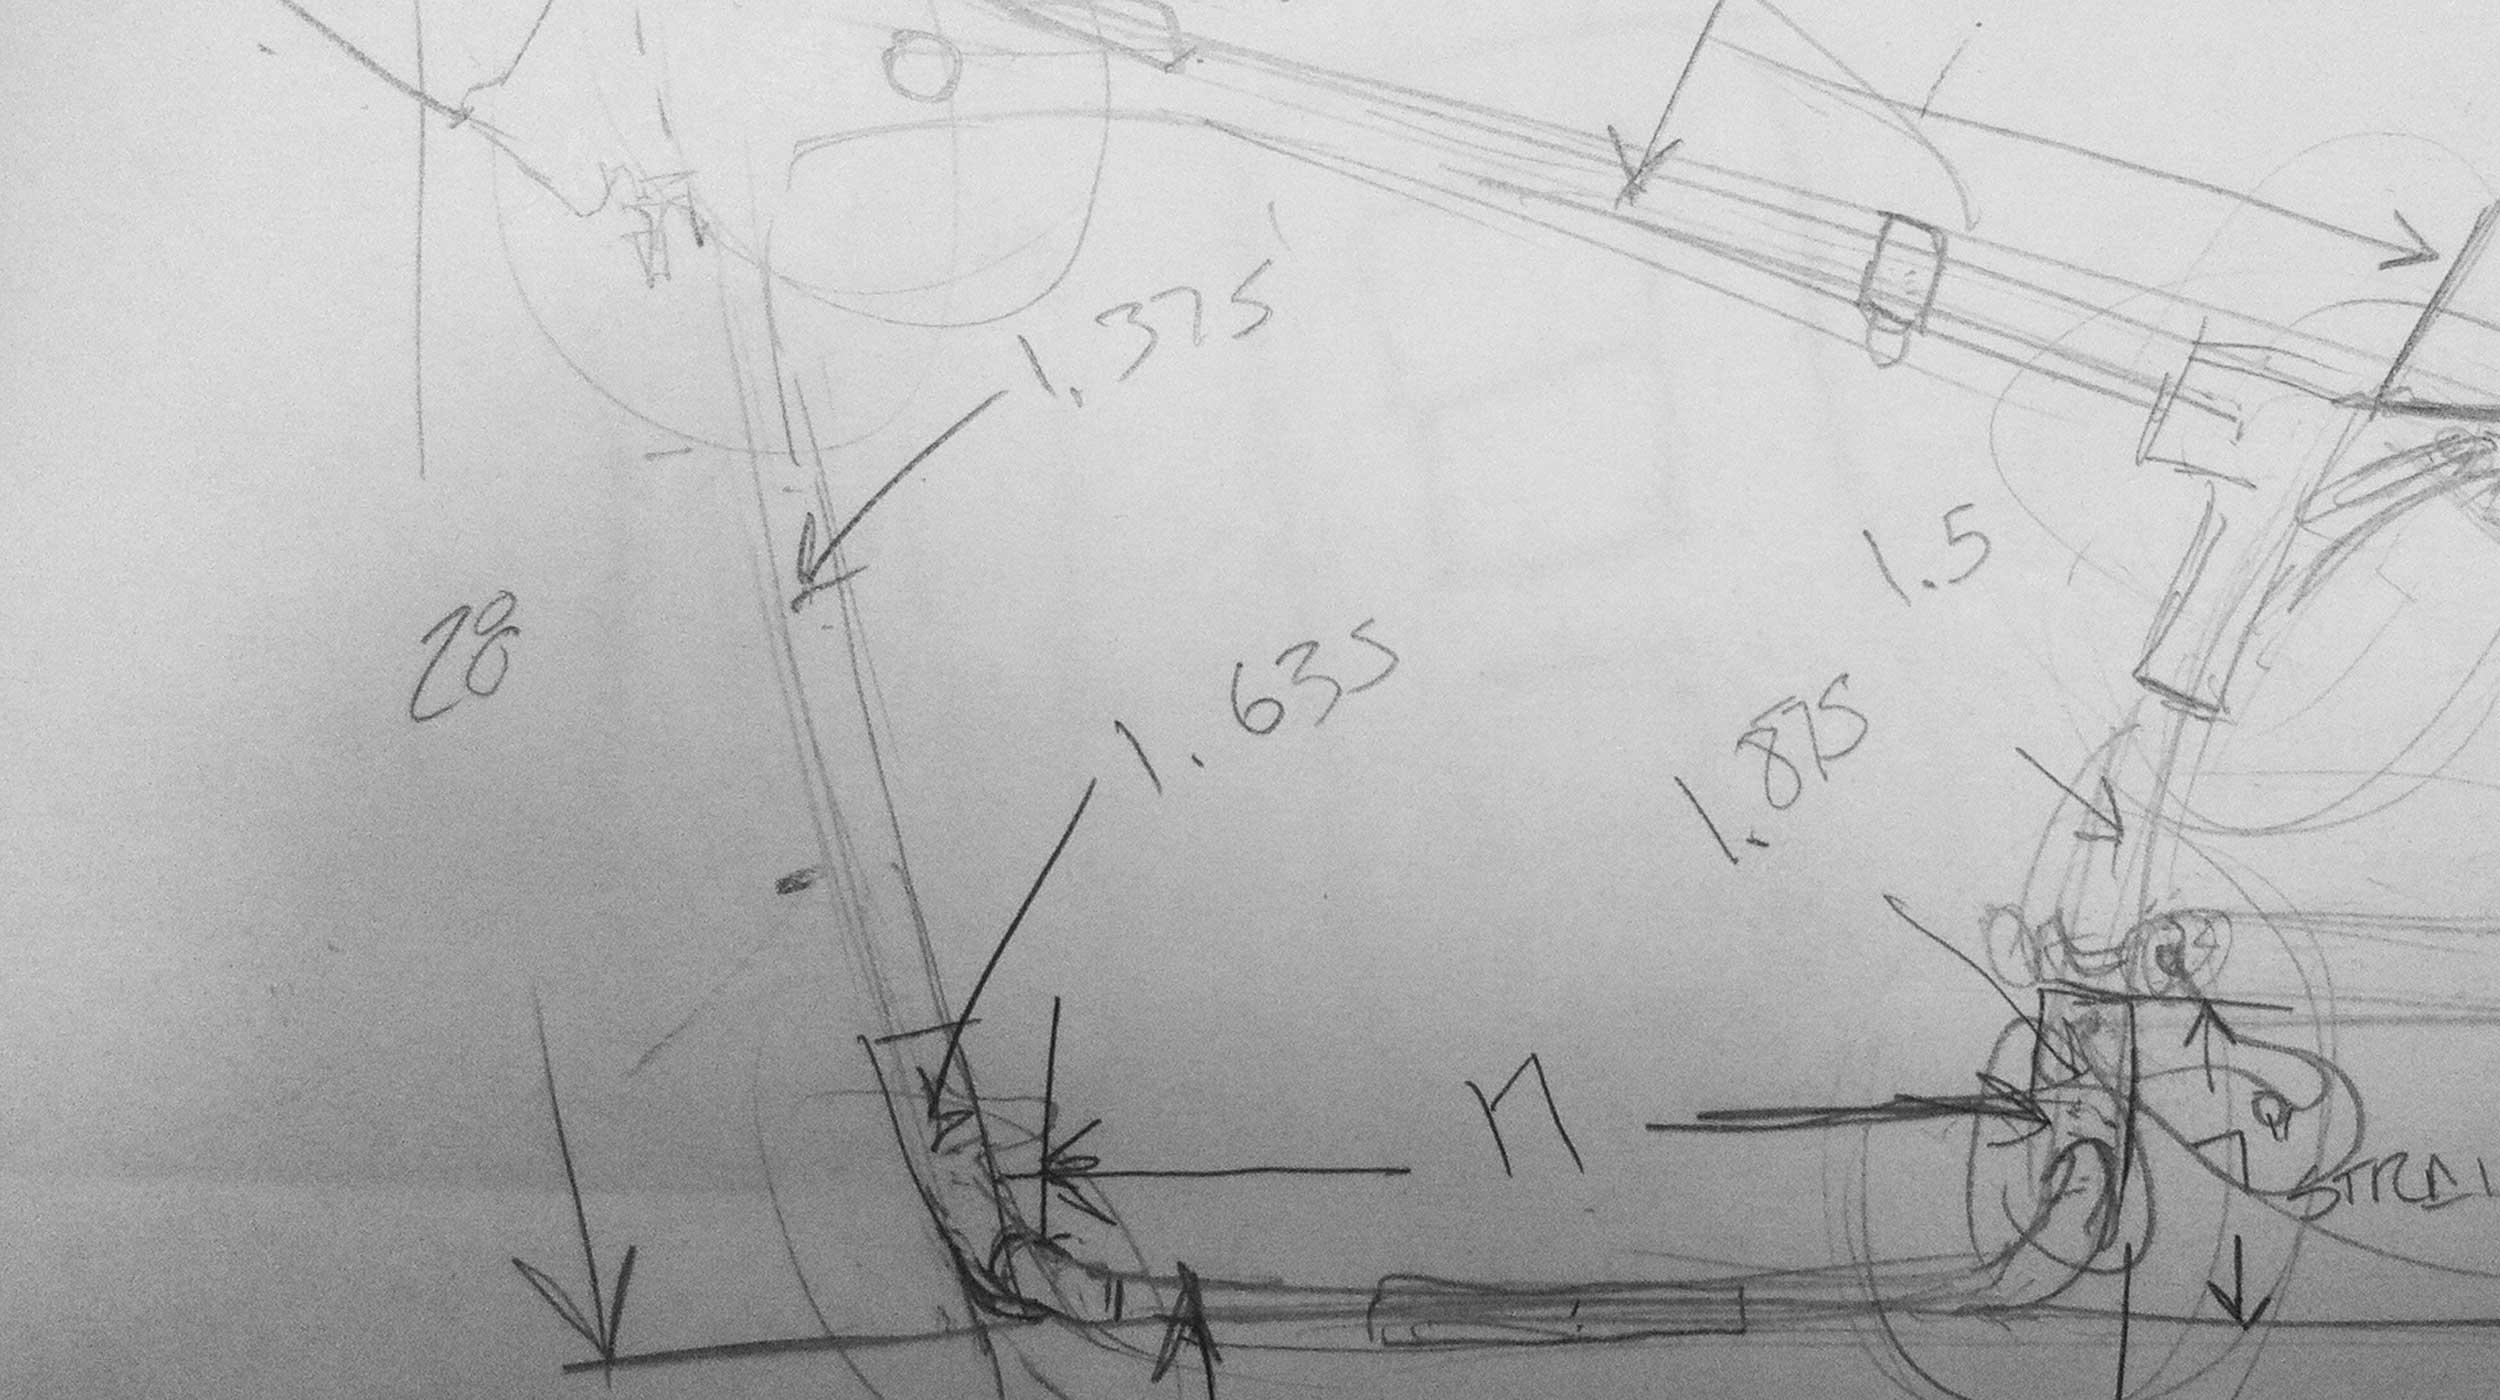 New-Sketch-2-April-9.jpg